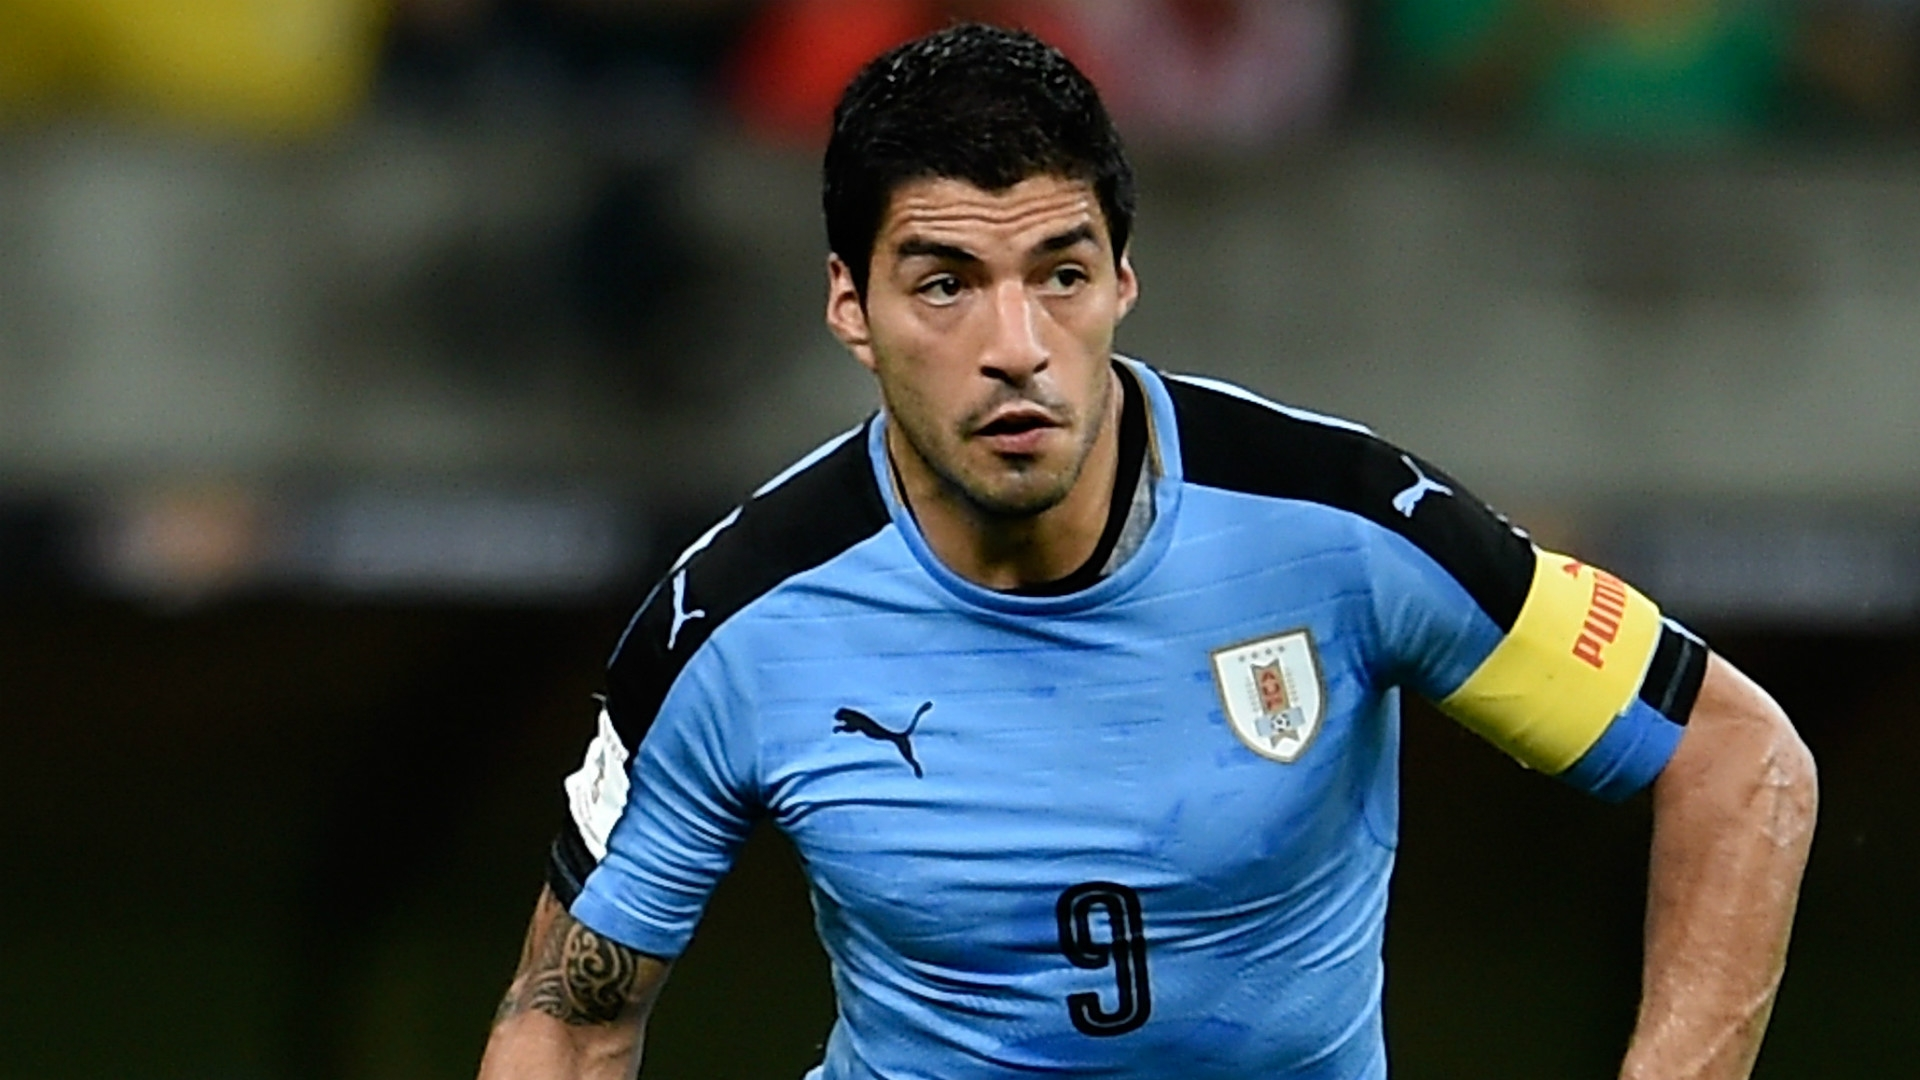 Luis Suarez (Barcelona) - Uruguay